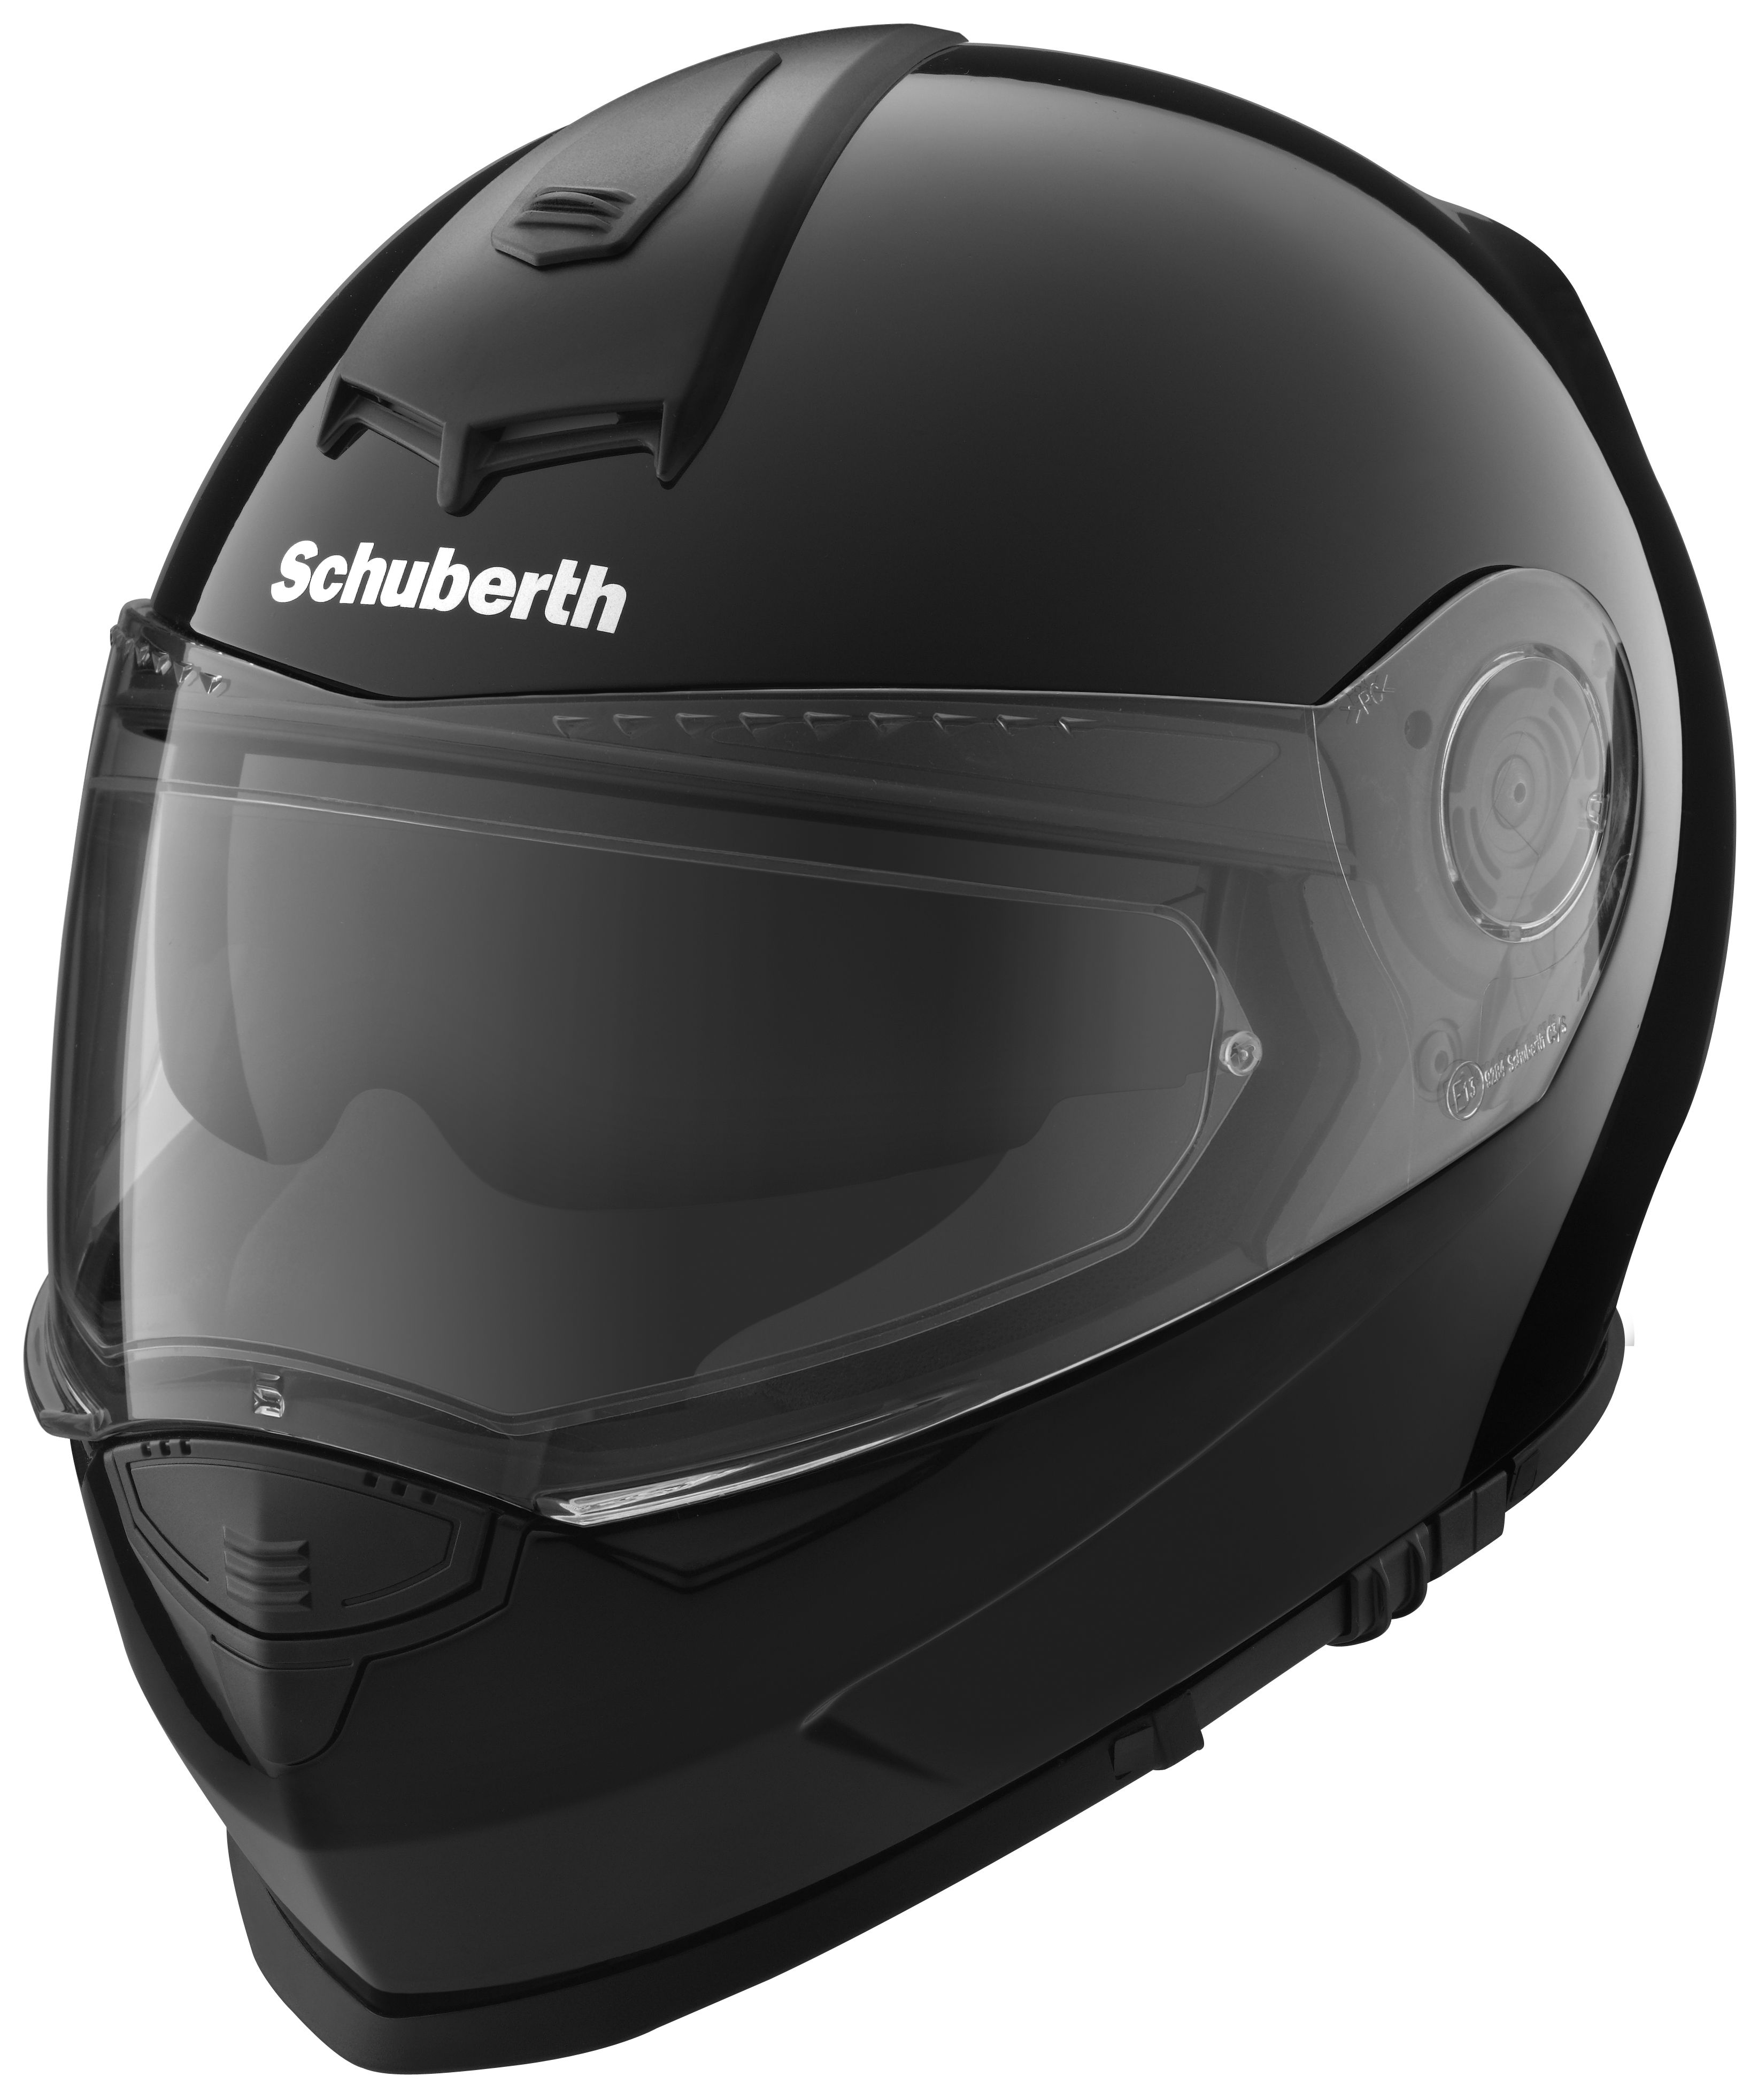 Schuberth S2 Review >> Schuberth S2 Helmet - RevZilla